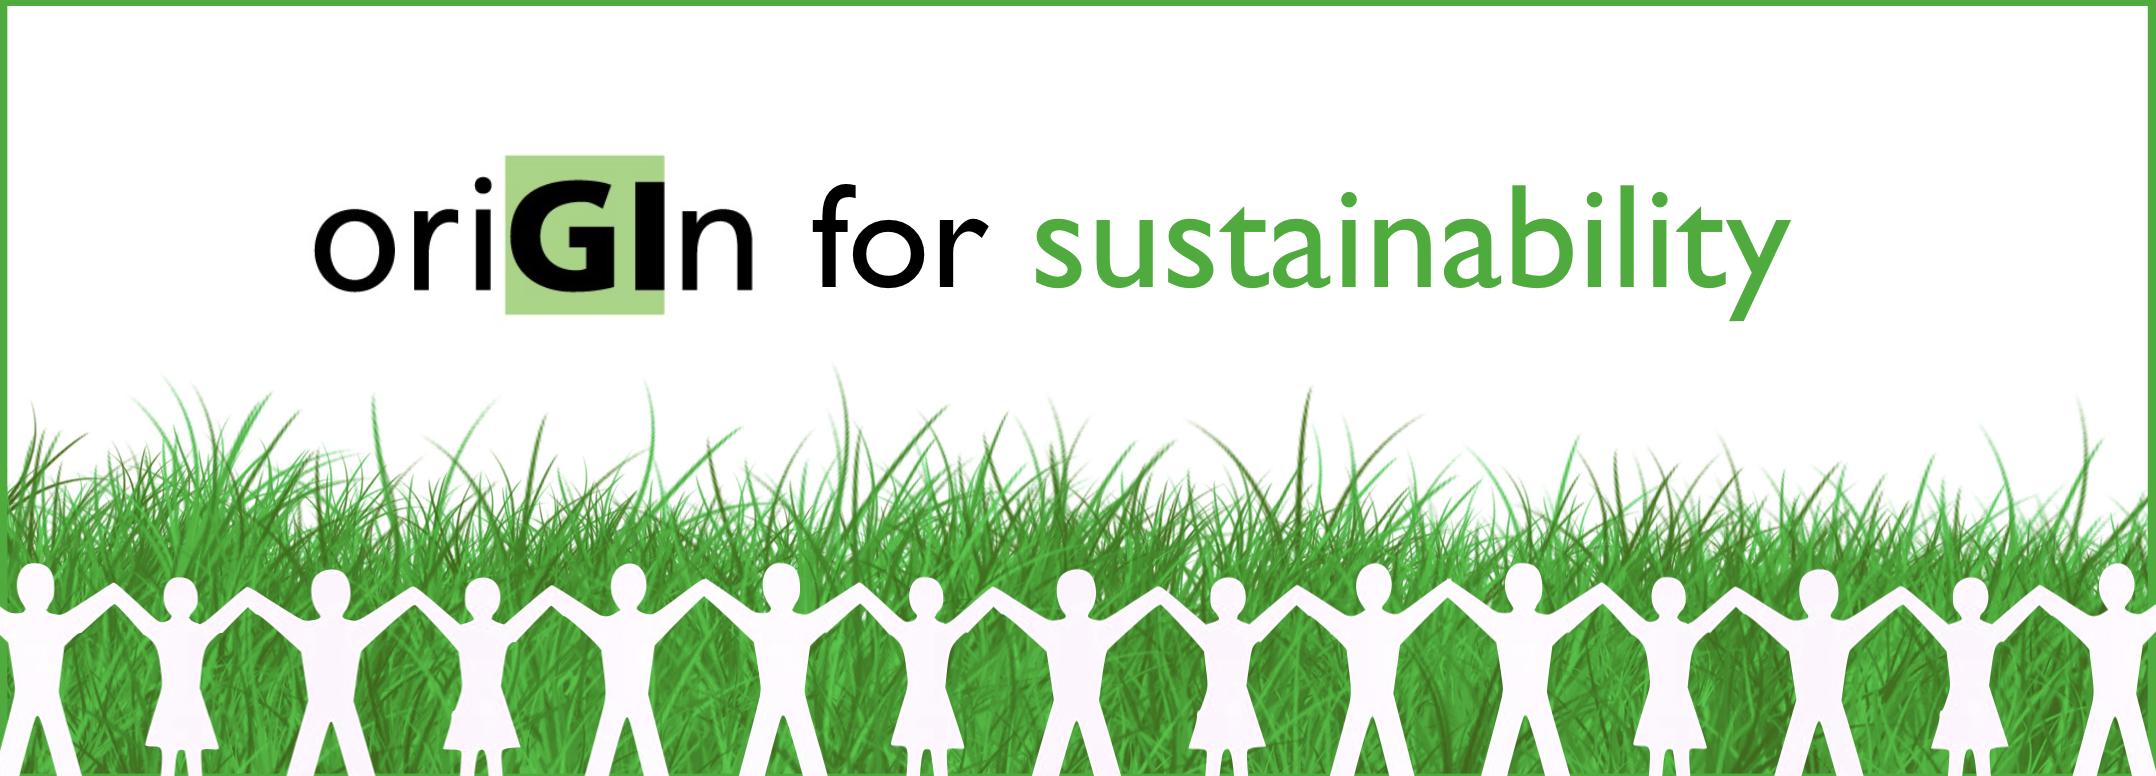 Final sustainability logo